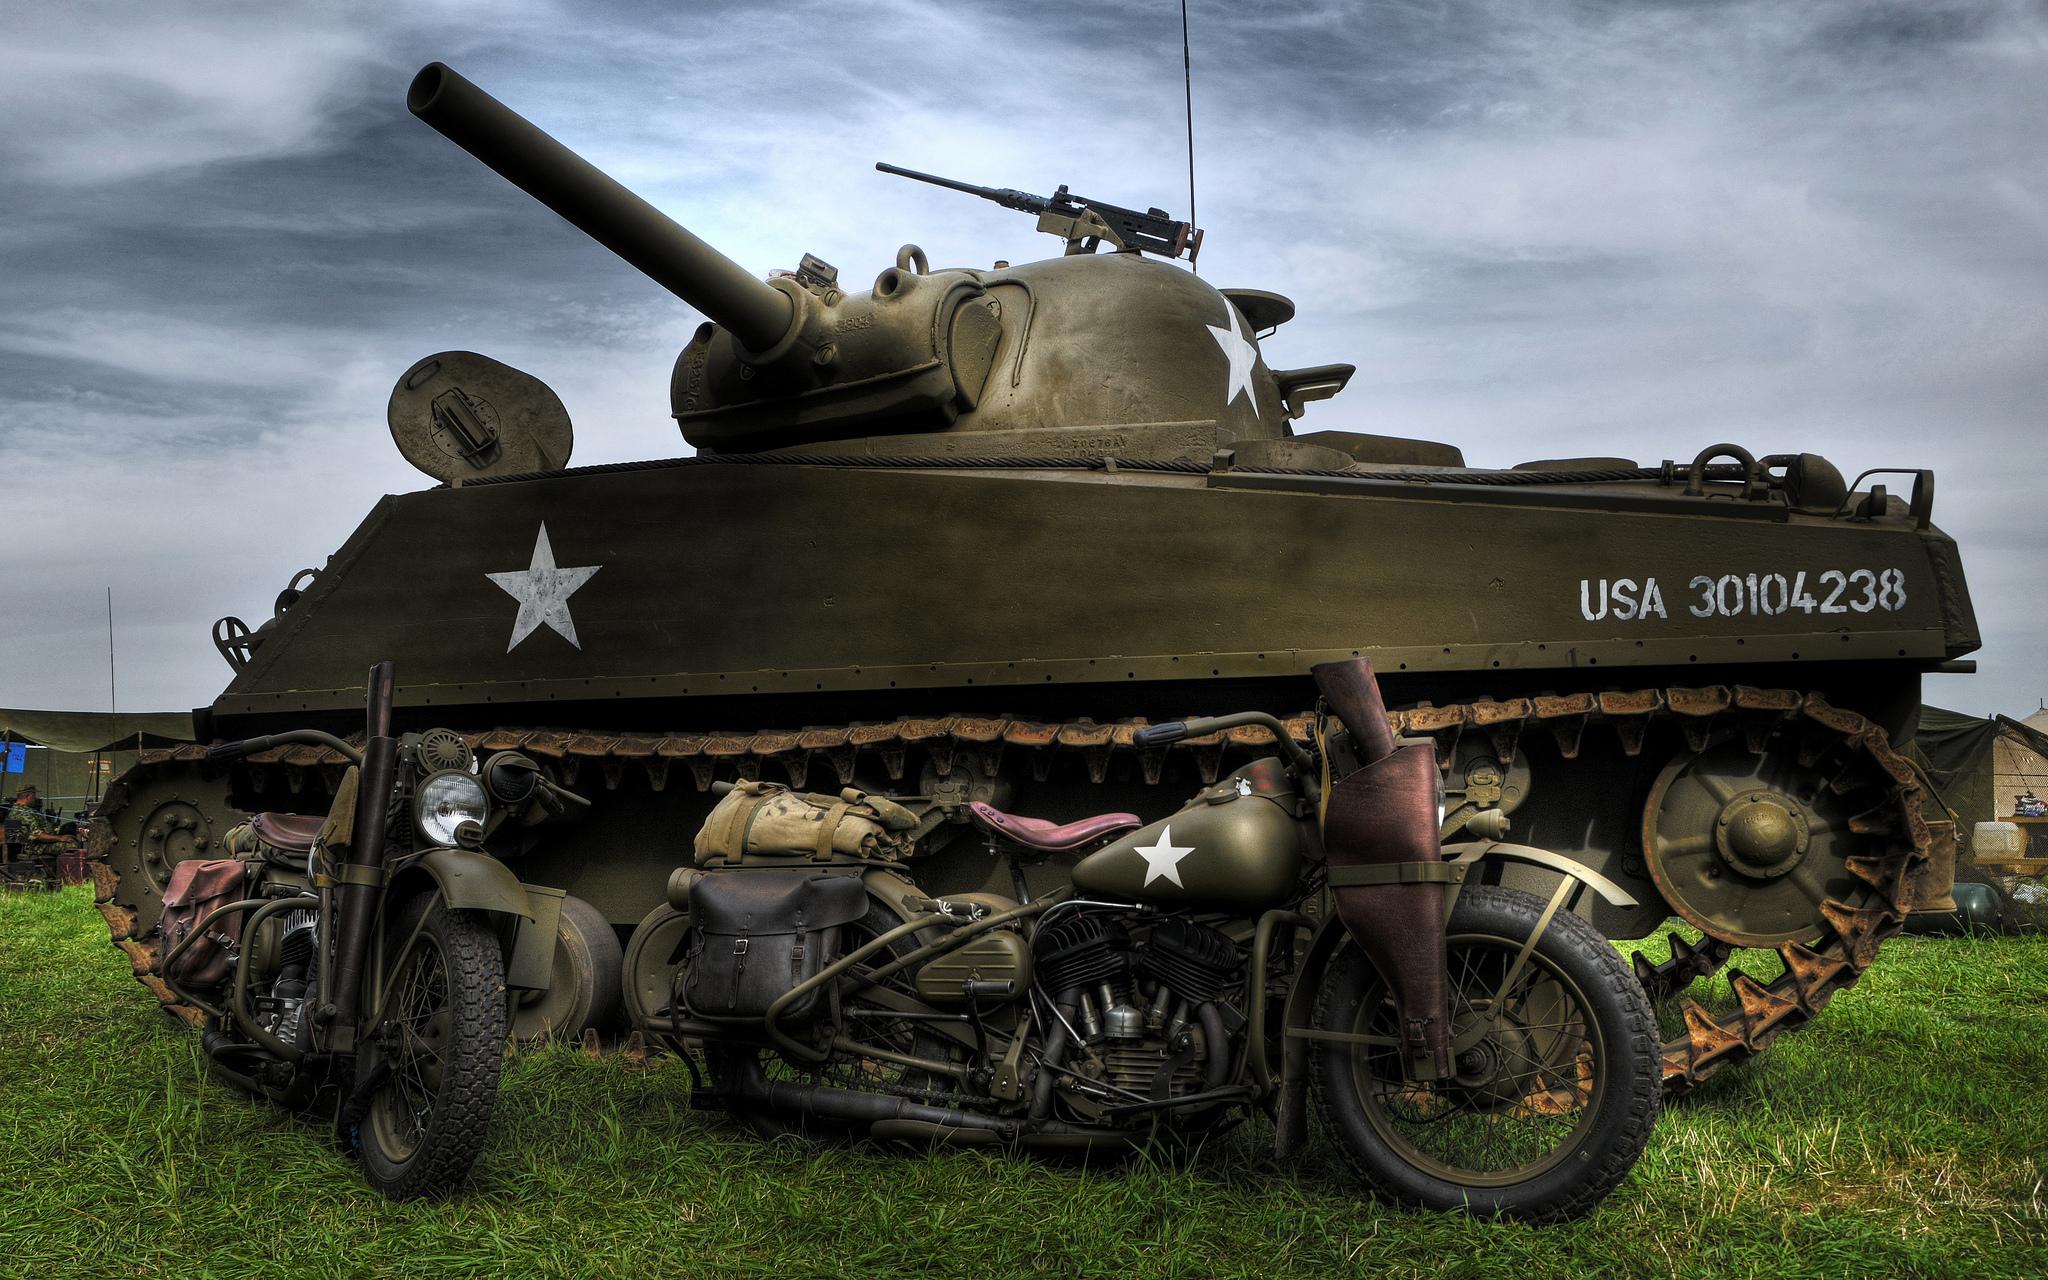 M4 Sherman and Harley Davidson WLA motorcycles Full HD 2048x1280